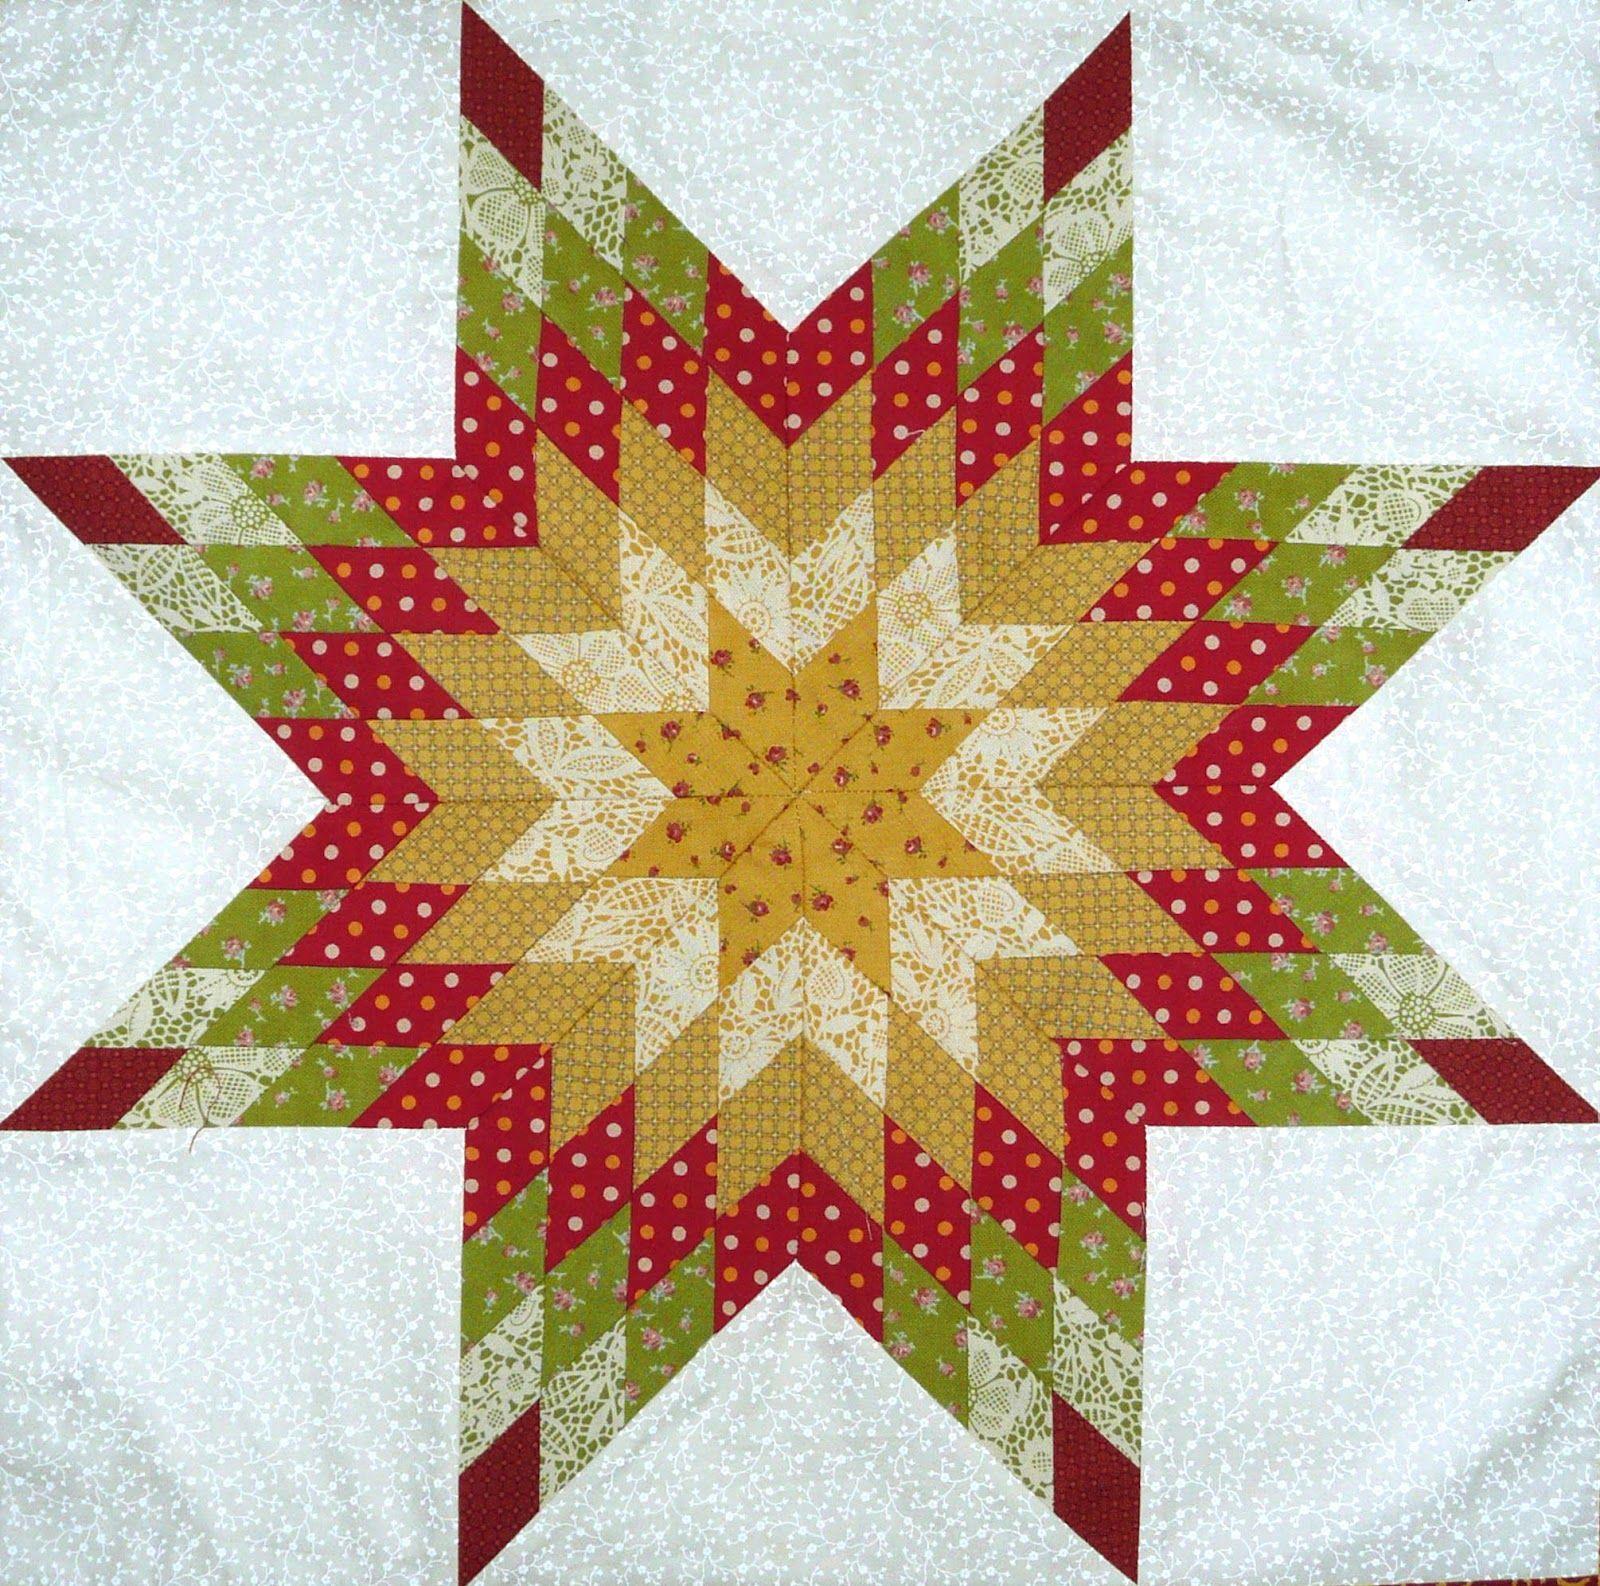 Lone Star Quilt Pattern Free Printable - Bing Images | Quilts - Quilt Patterns Free Printable